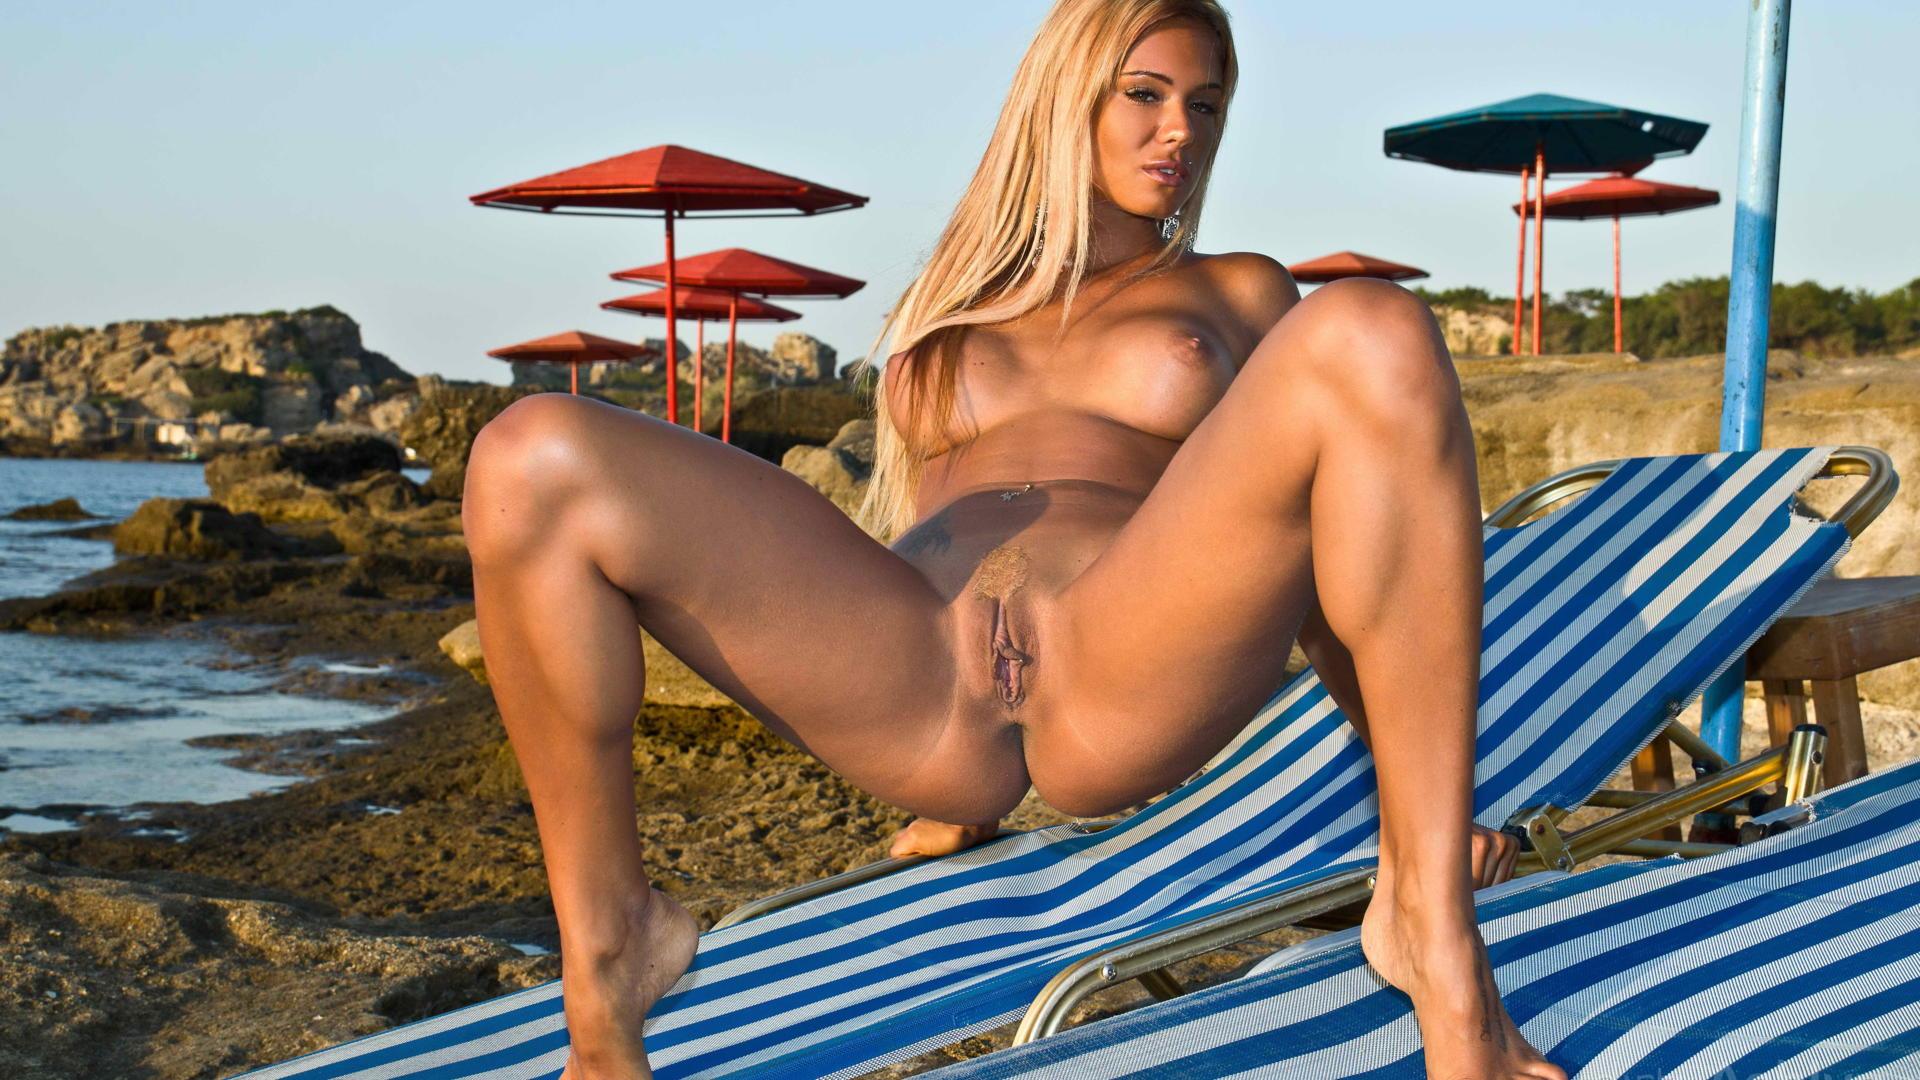 hot legs pussy beach